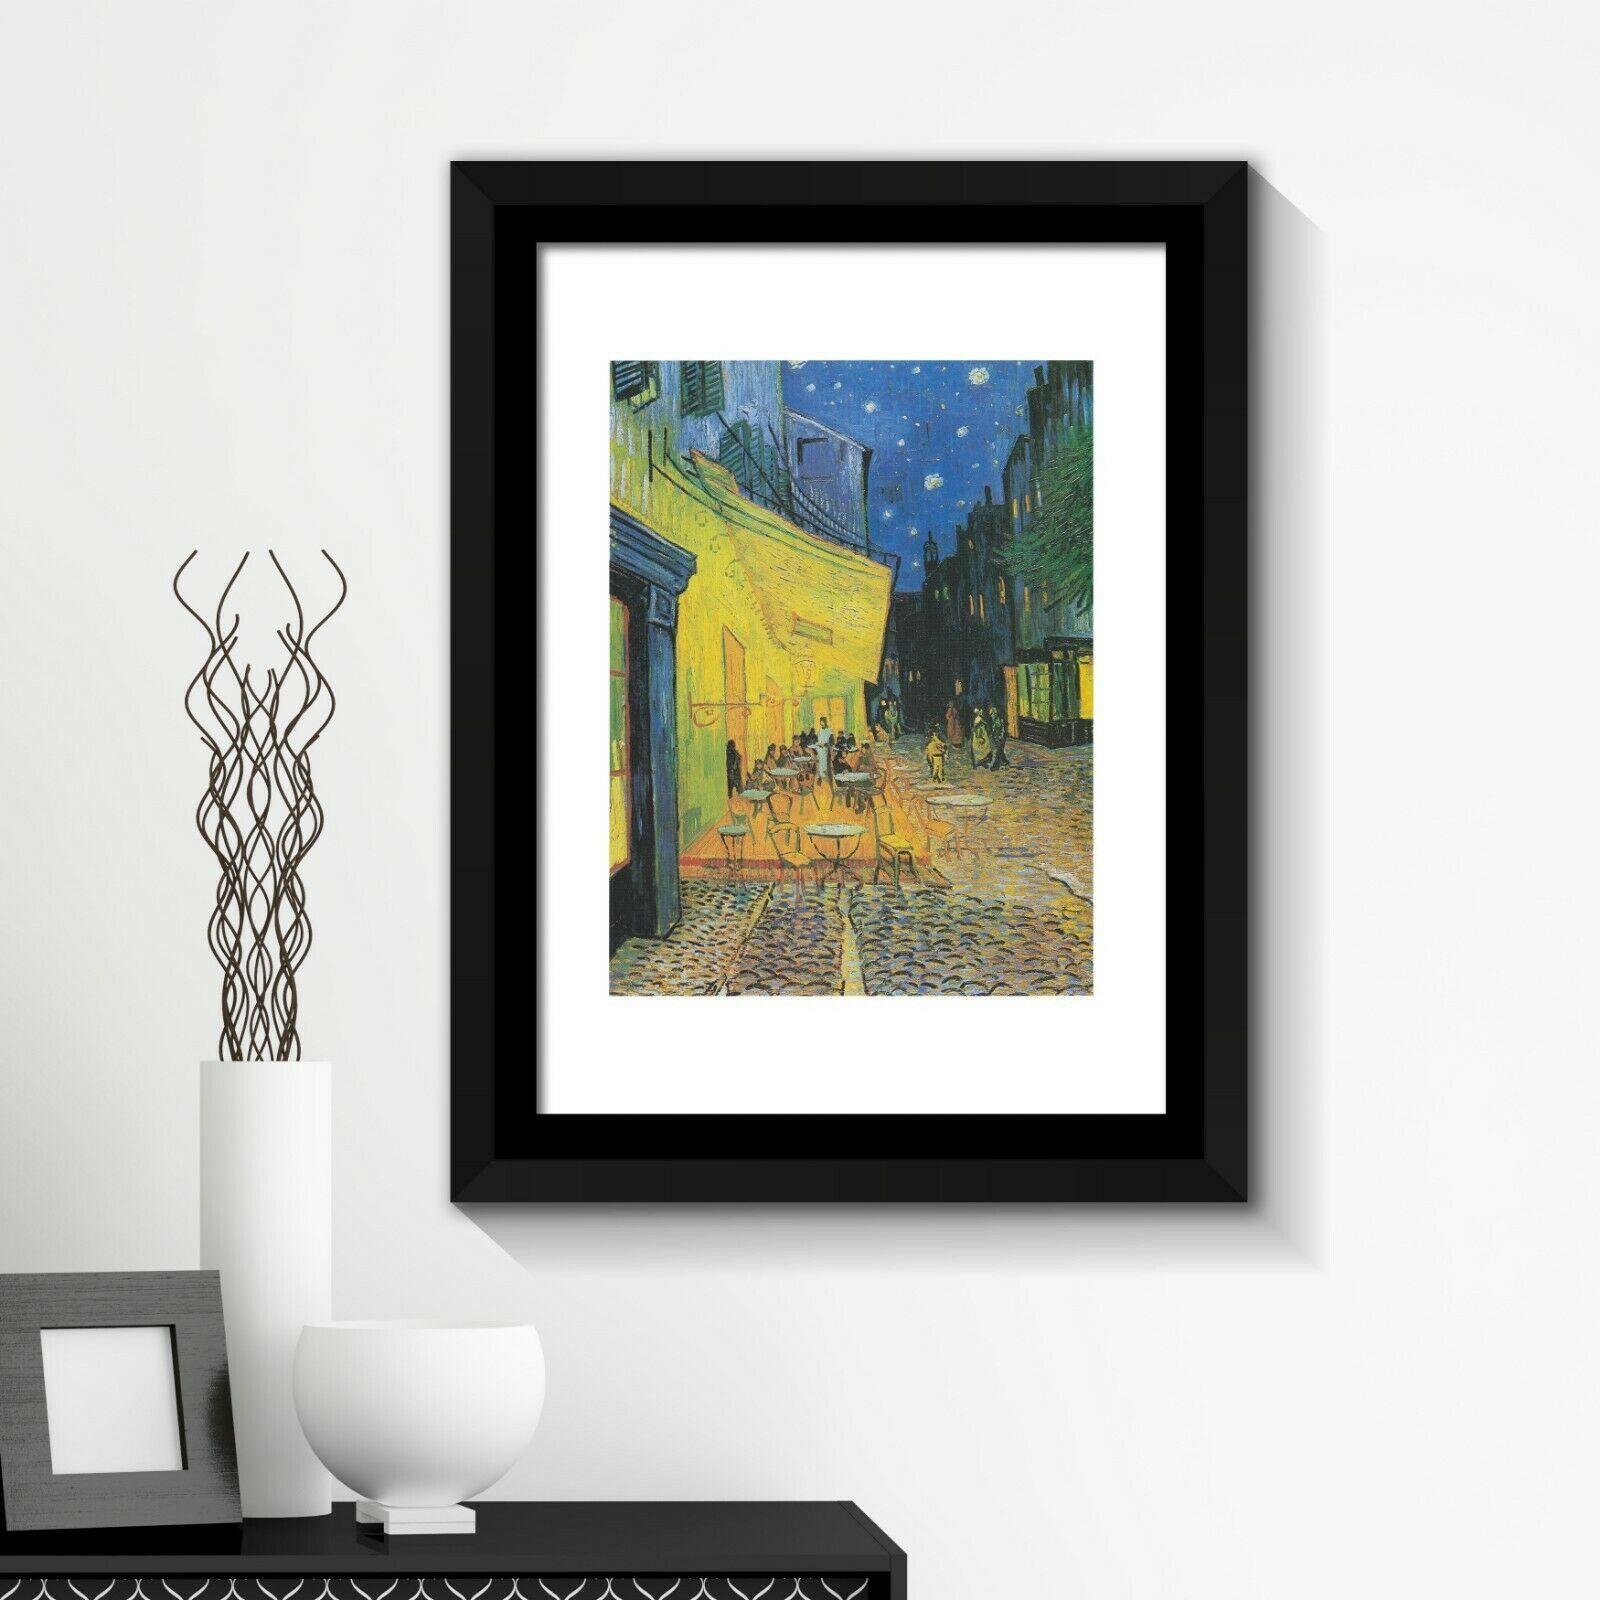 Framed Art 2in1 Painting Poster - Café Terrence at Night, 1888 by Vincent van Gogh Framed Photo, Framed Art